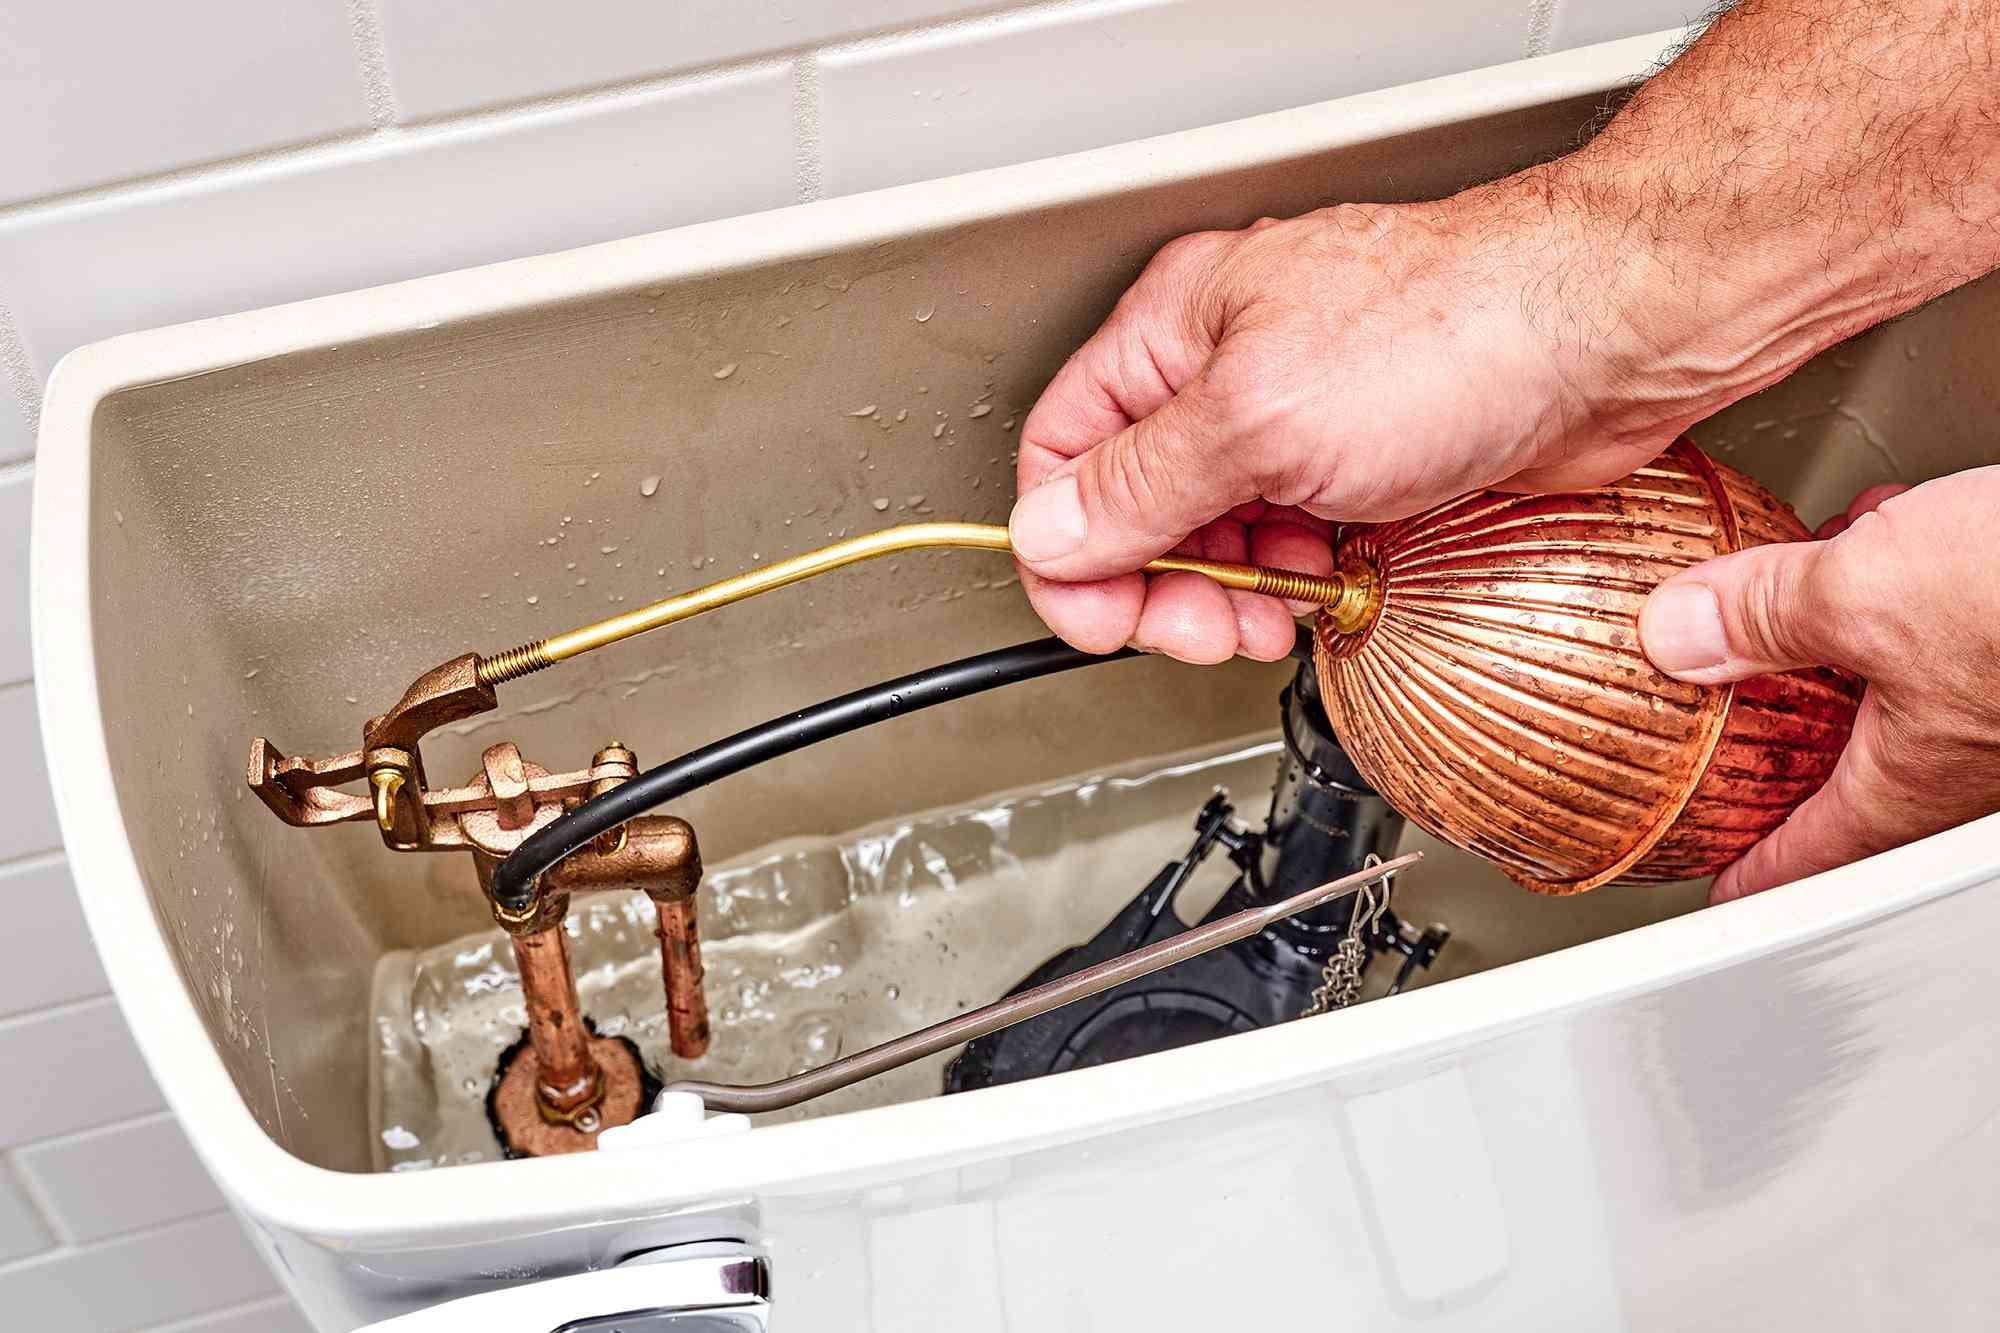 Float rod gently bent to adjust water level in toilet tank